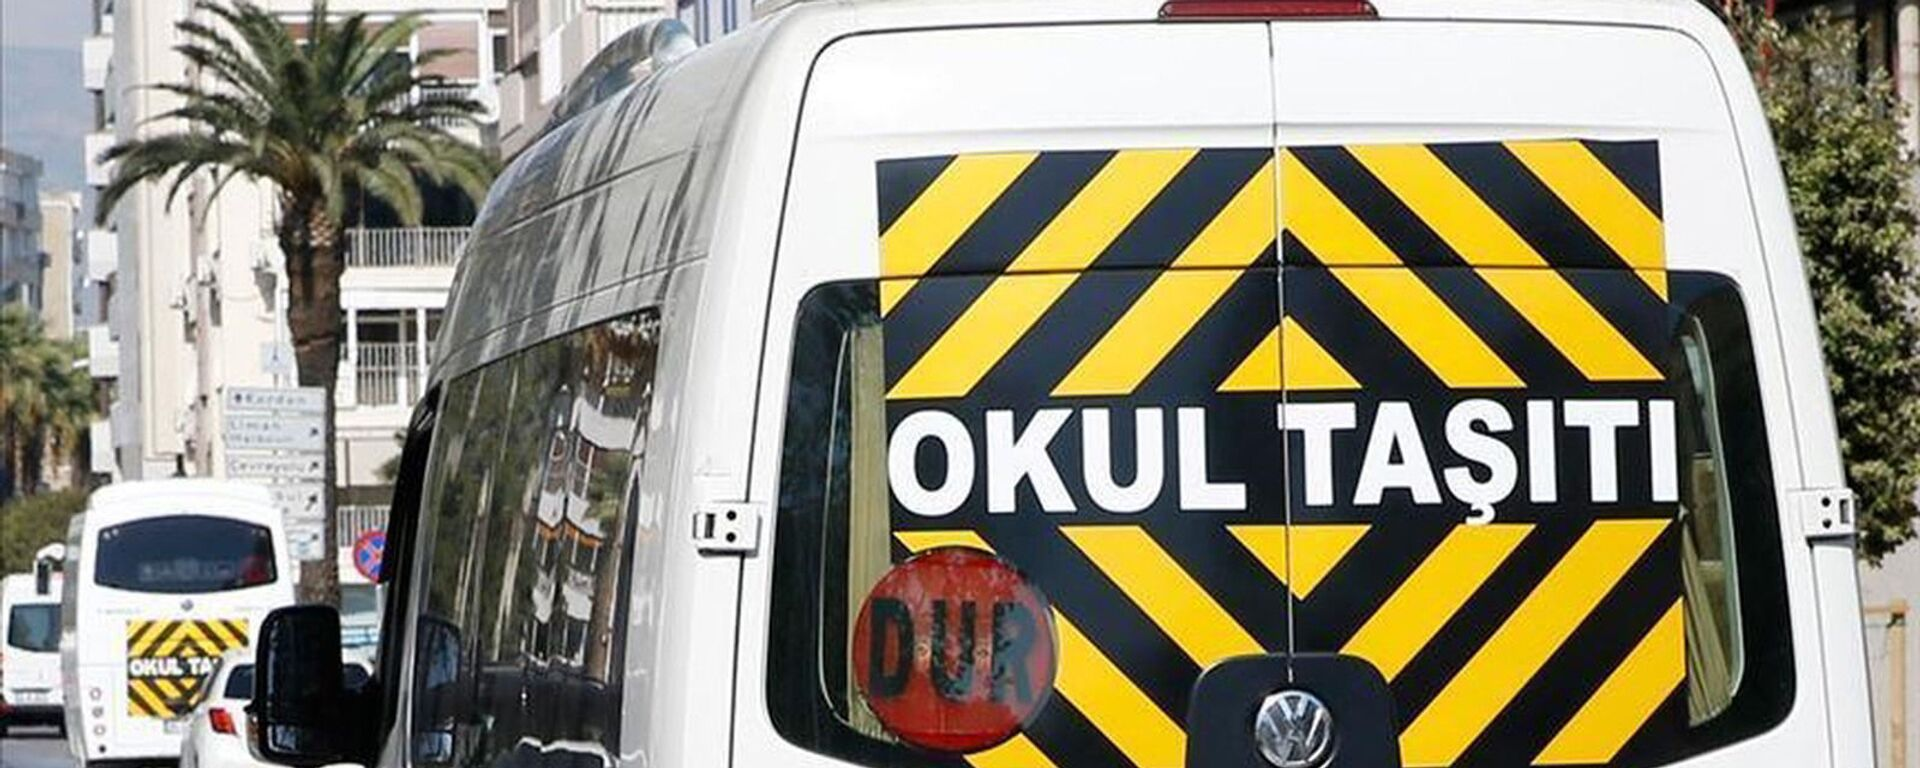 Okul servisi, Okul servisleri - Sputnik Türkiye, 1920, 27.08.2021